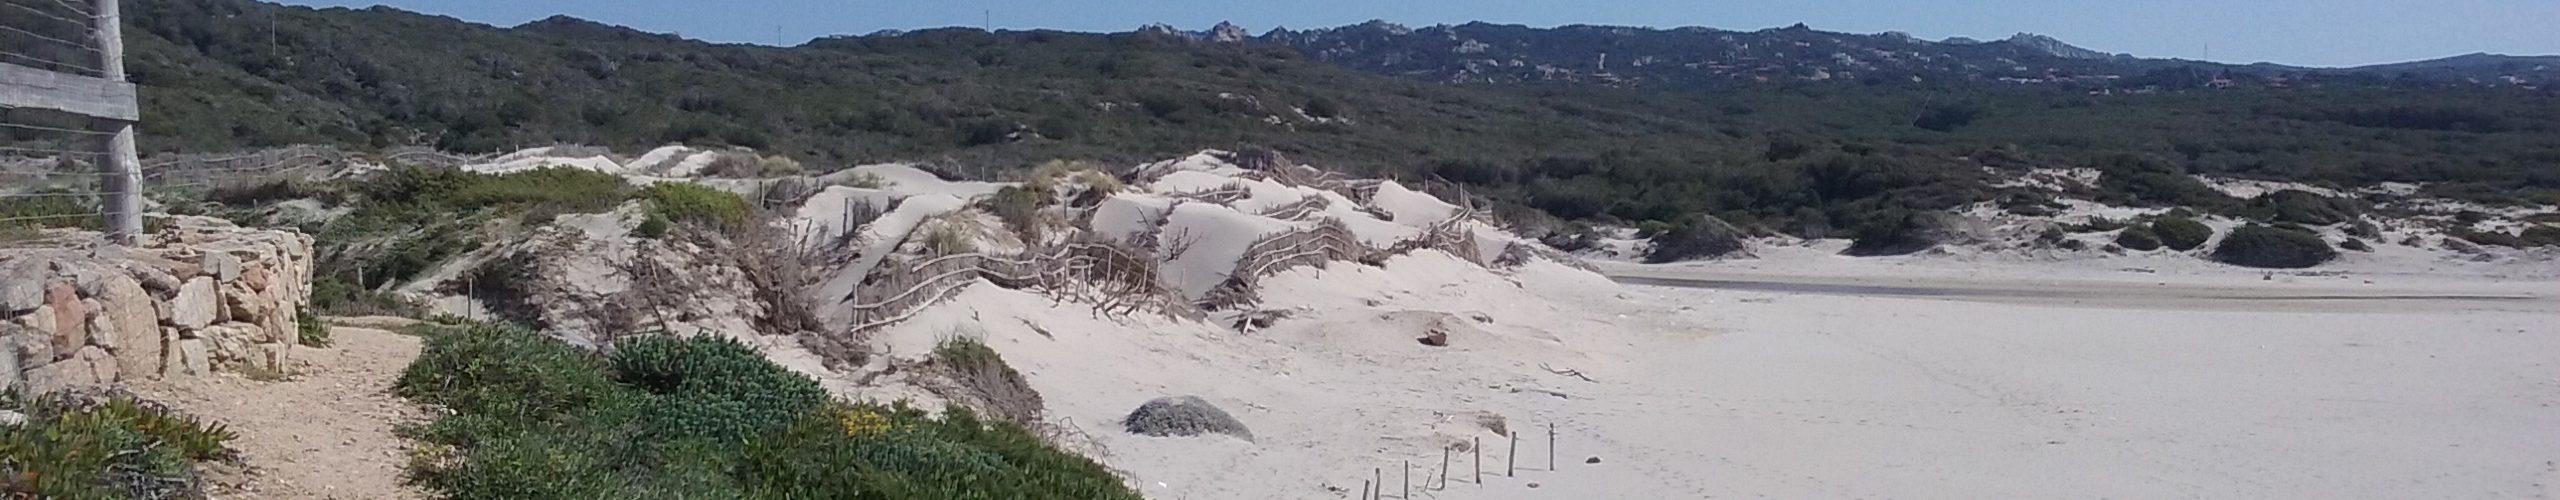 Dune Rena Majore